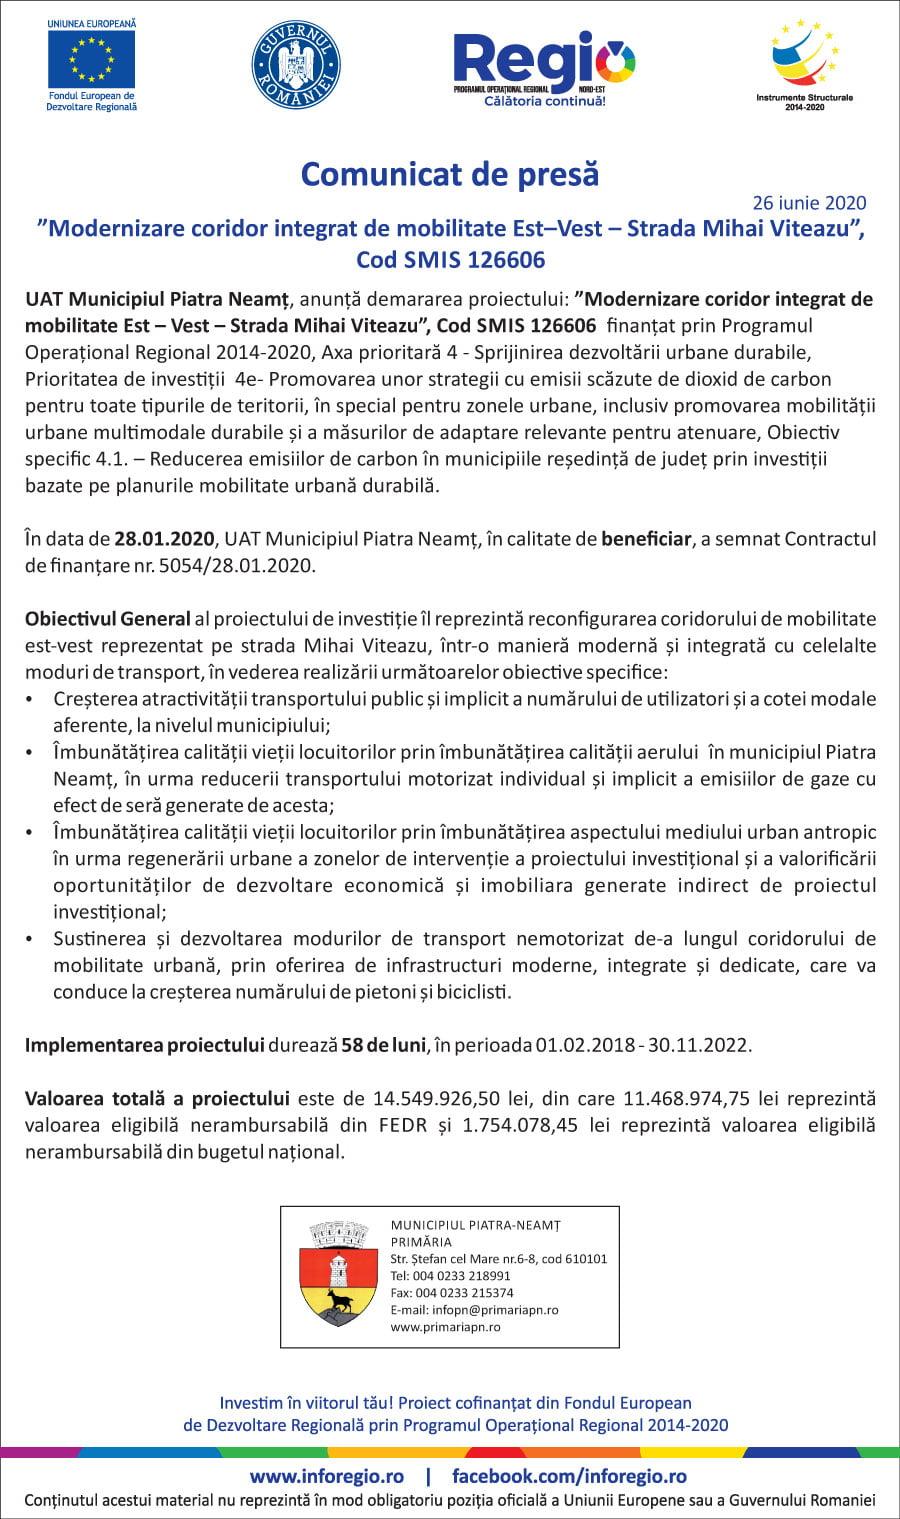 comunicat-de-presa-piatra-neamt-606-26-iunie-2020-min